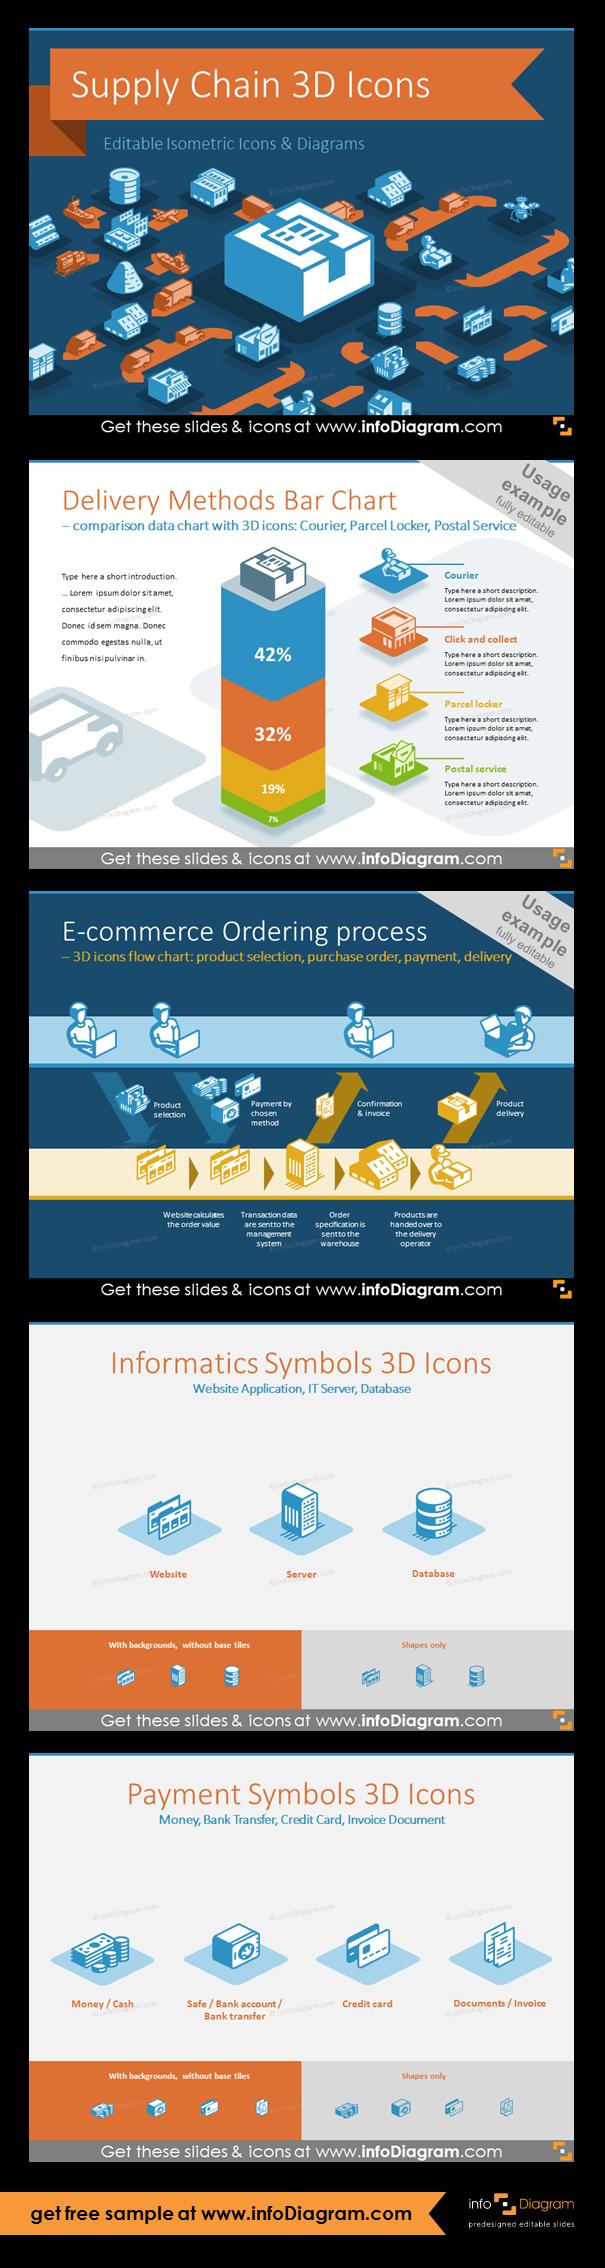 delivery methods bar chart comparison data chart with 3d icons courier parcel locker postal service e commerce ordering process 3d icons flow  [ 605 x 2268 Pixel ]